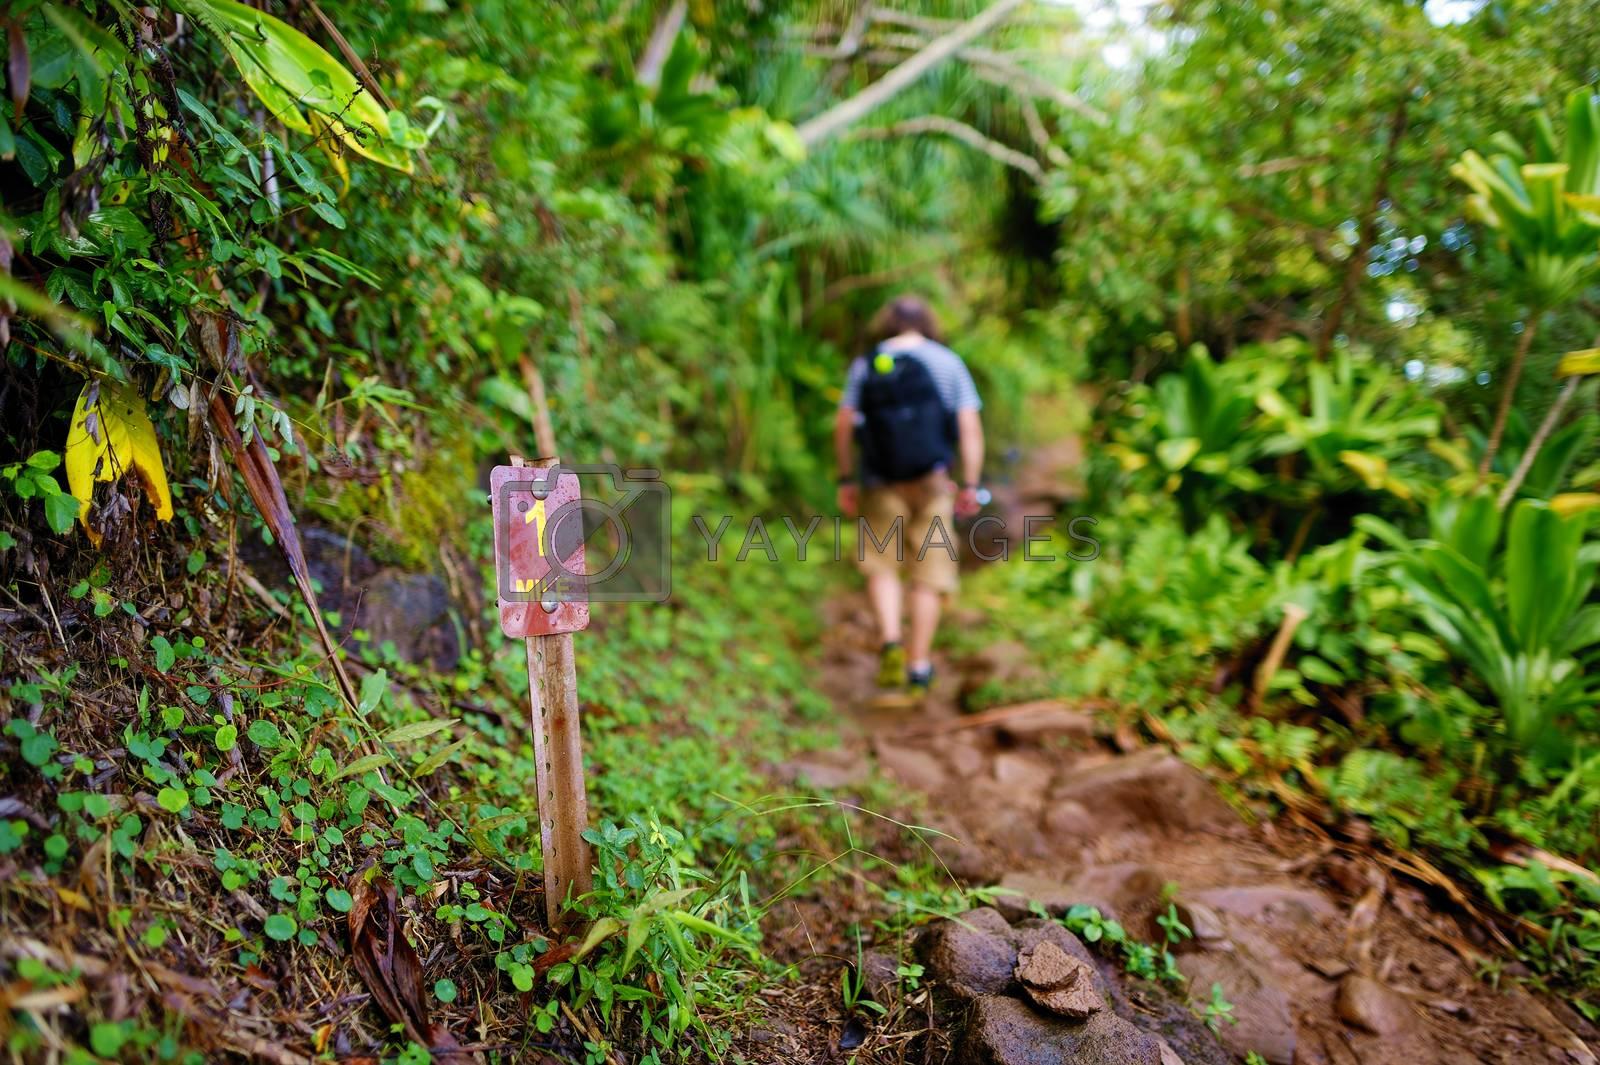 One mile sign on Kalalau trail in Kauai, Hawaii